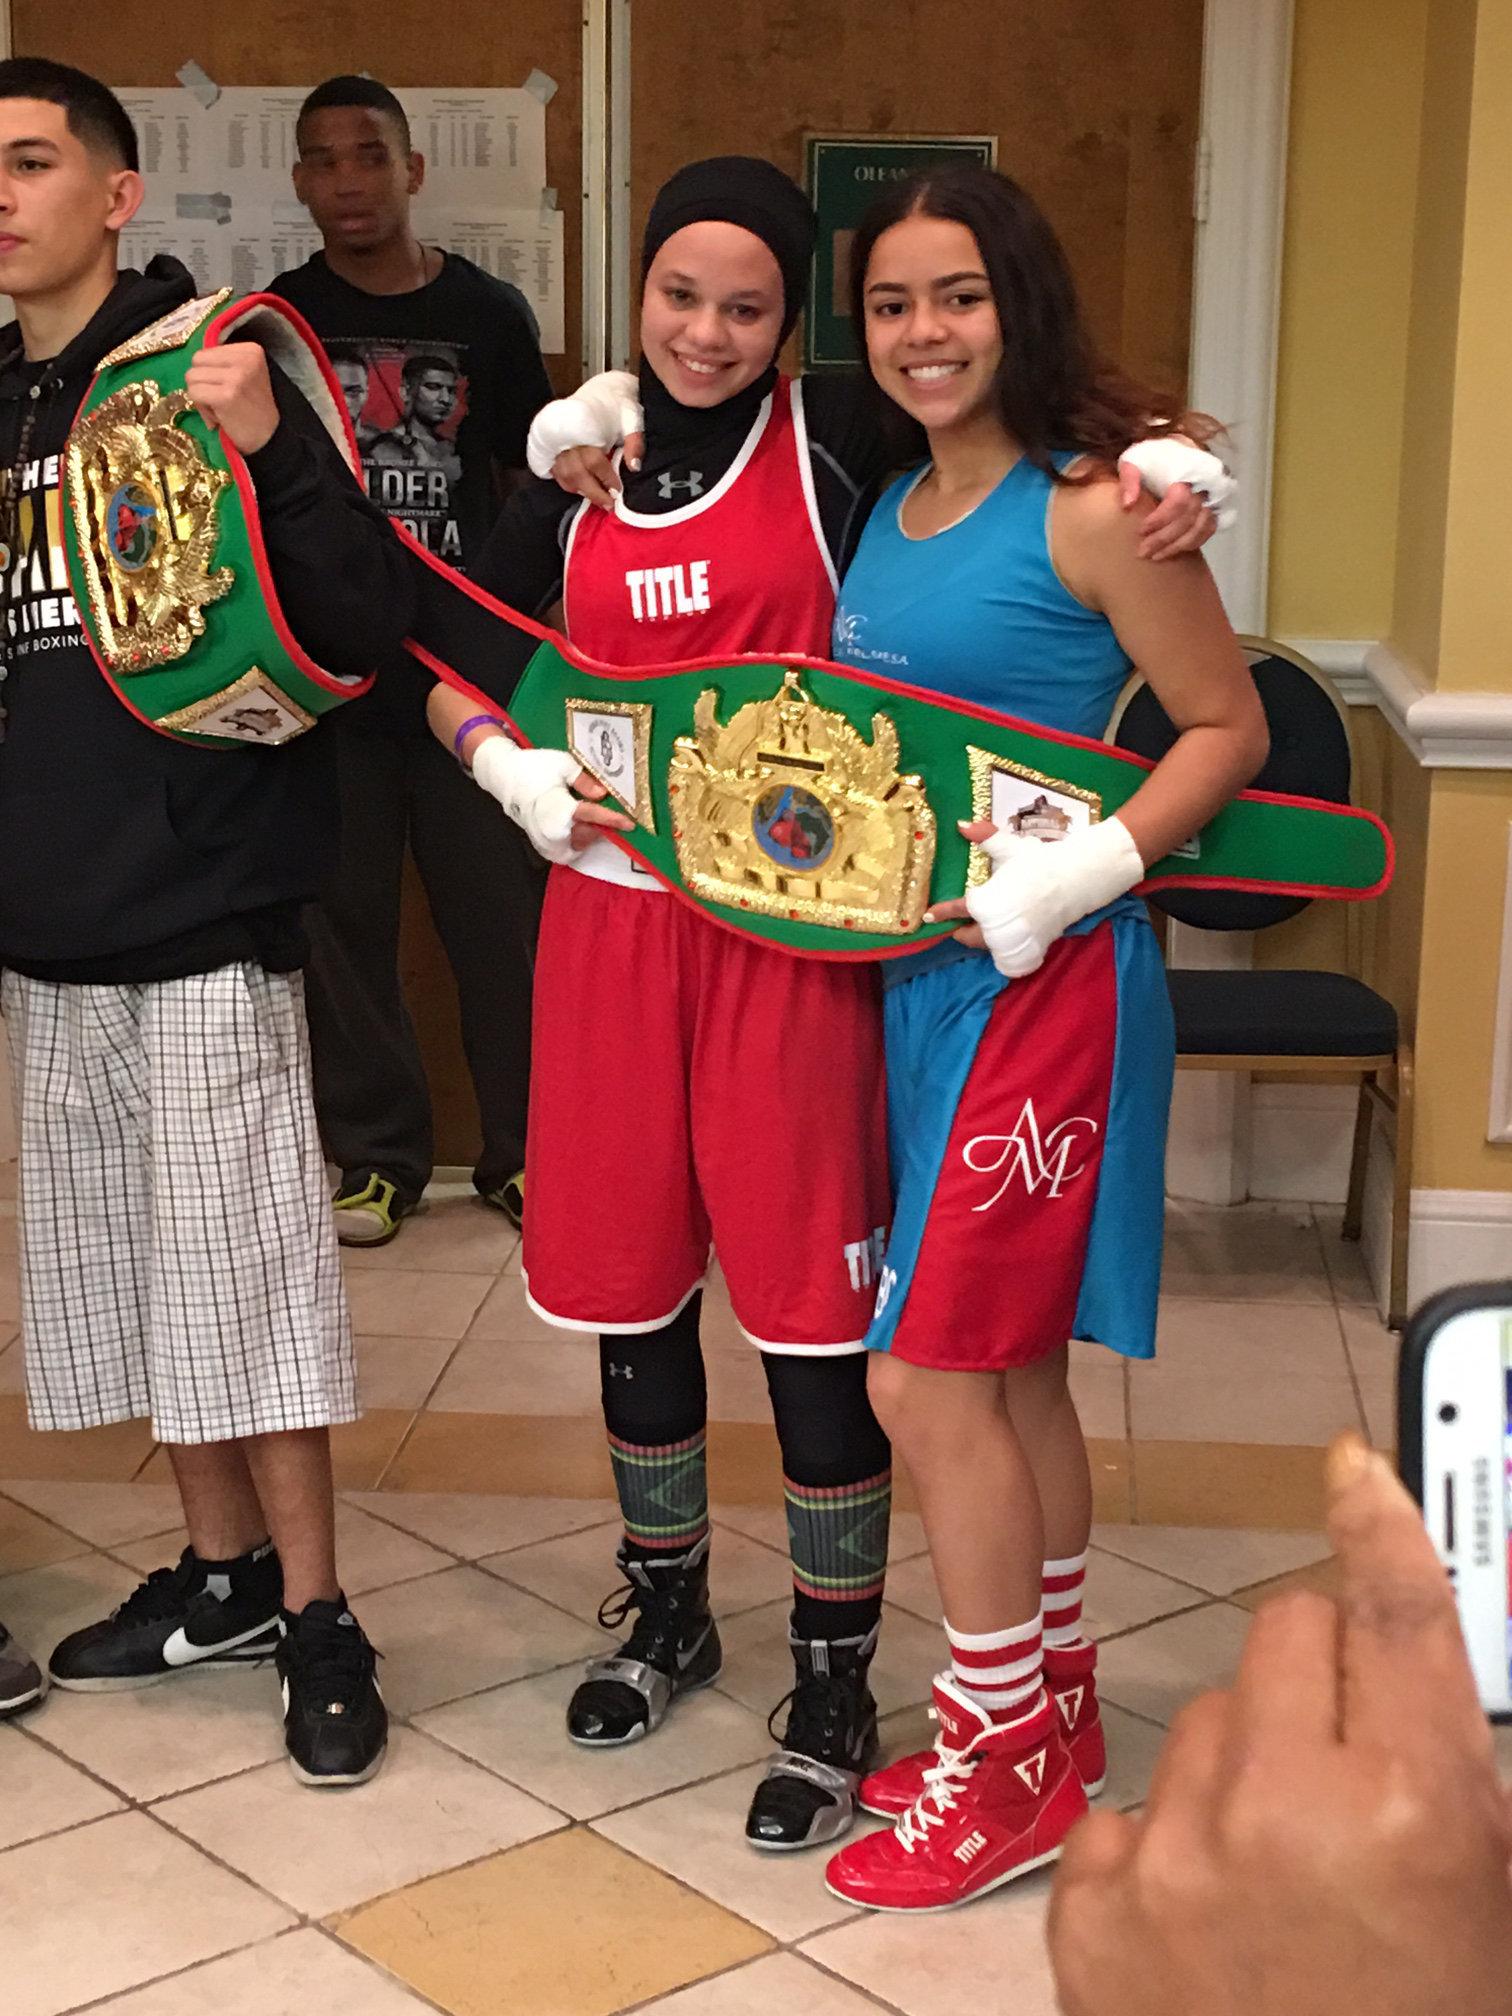 Amaiya Zafar (left) poses withAliyah